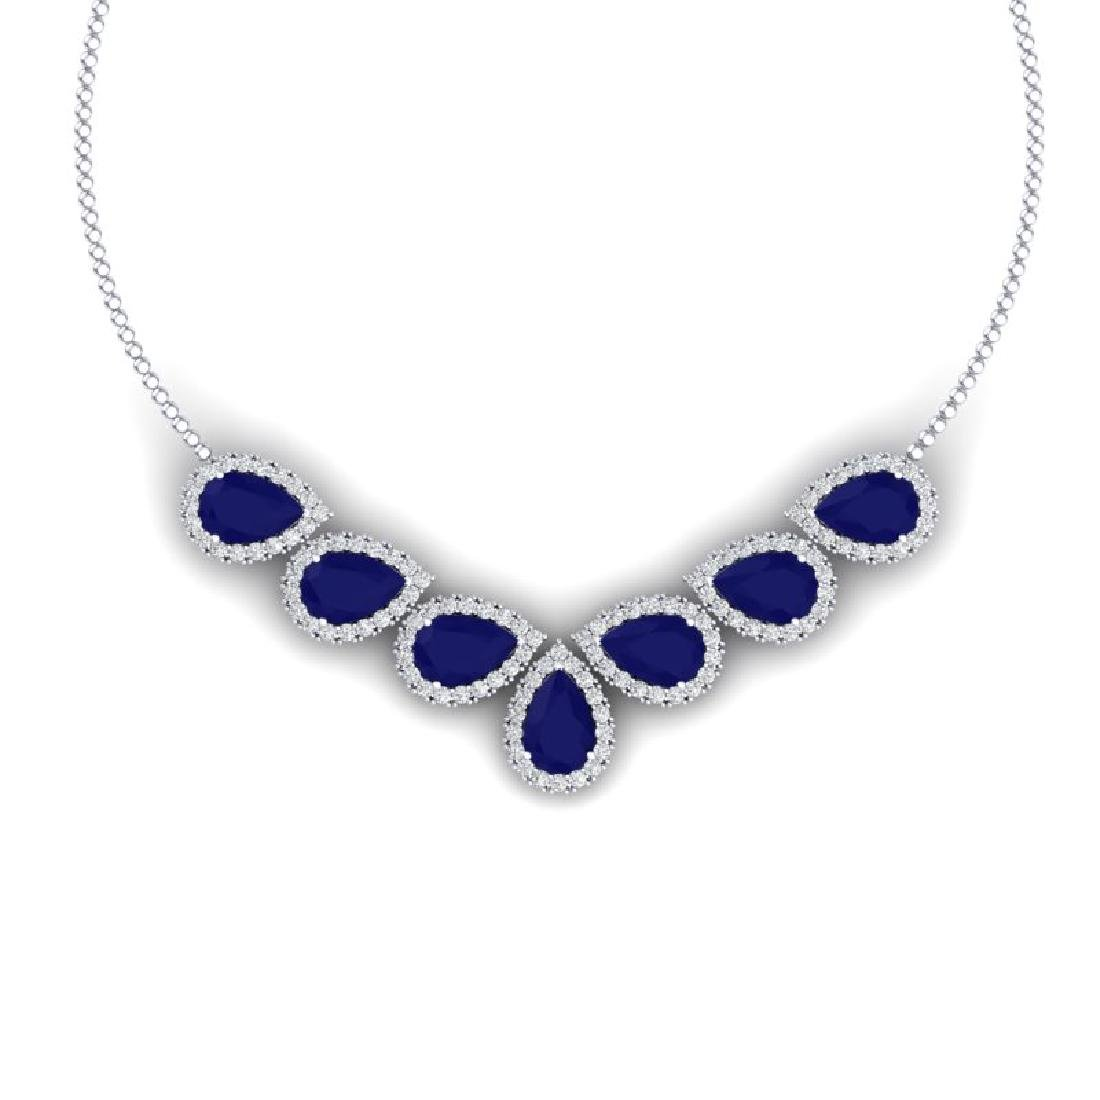 34.72 CTW Royalty Sapphire & VS Diamond Necklace 18K